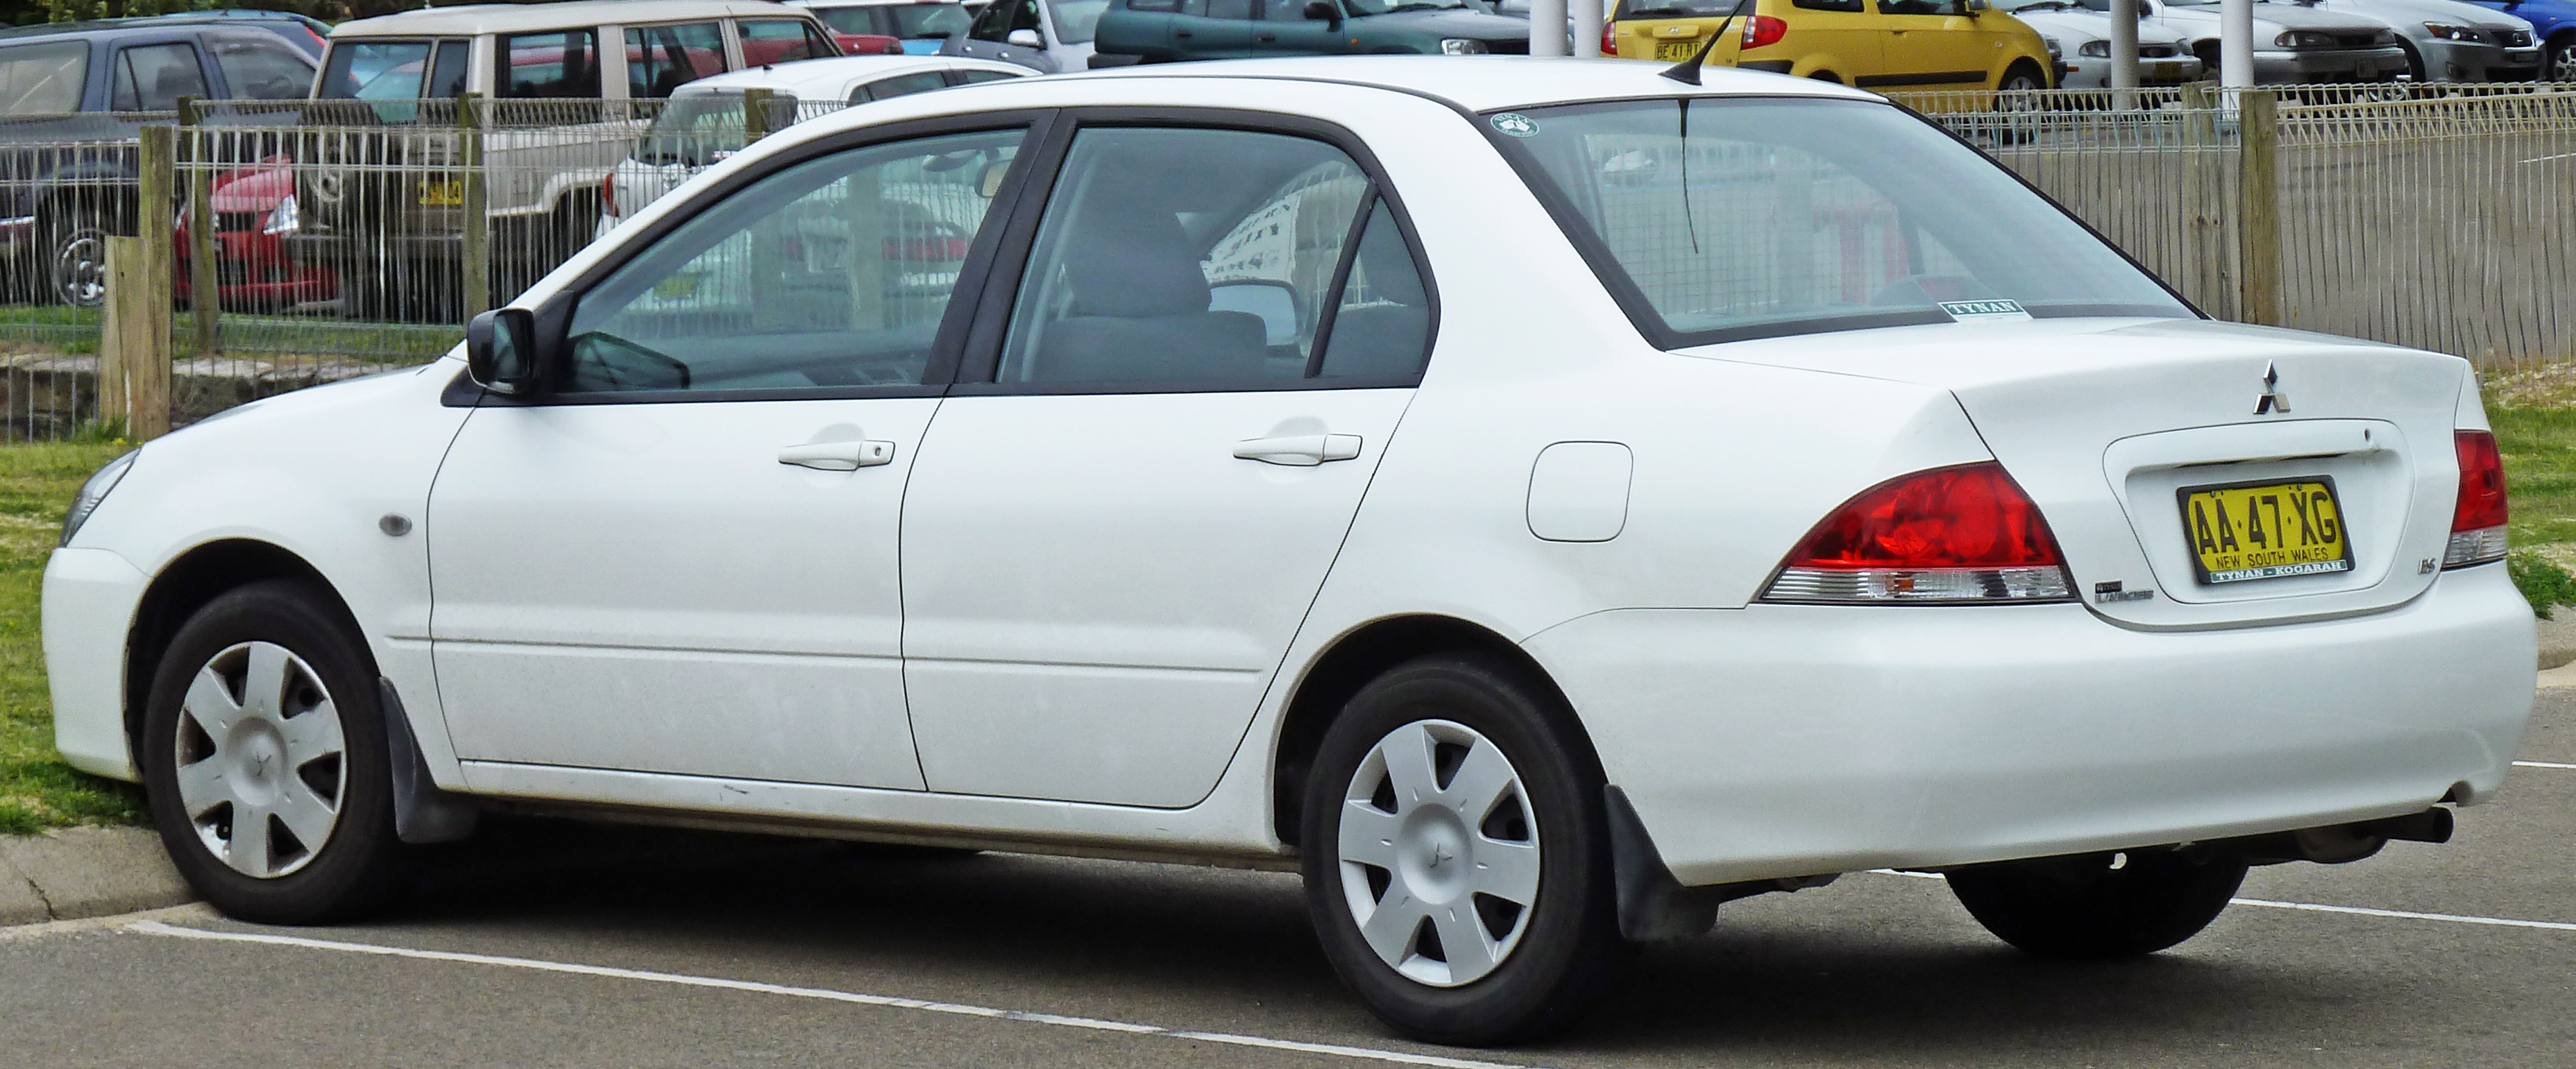 2005 Mitsubishi Lancer - Information and photos - ZombieDrive